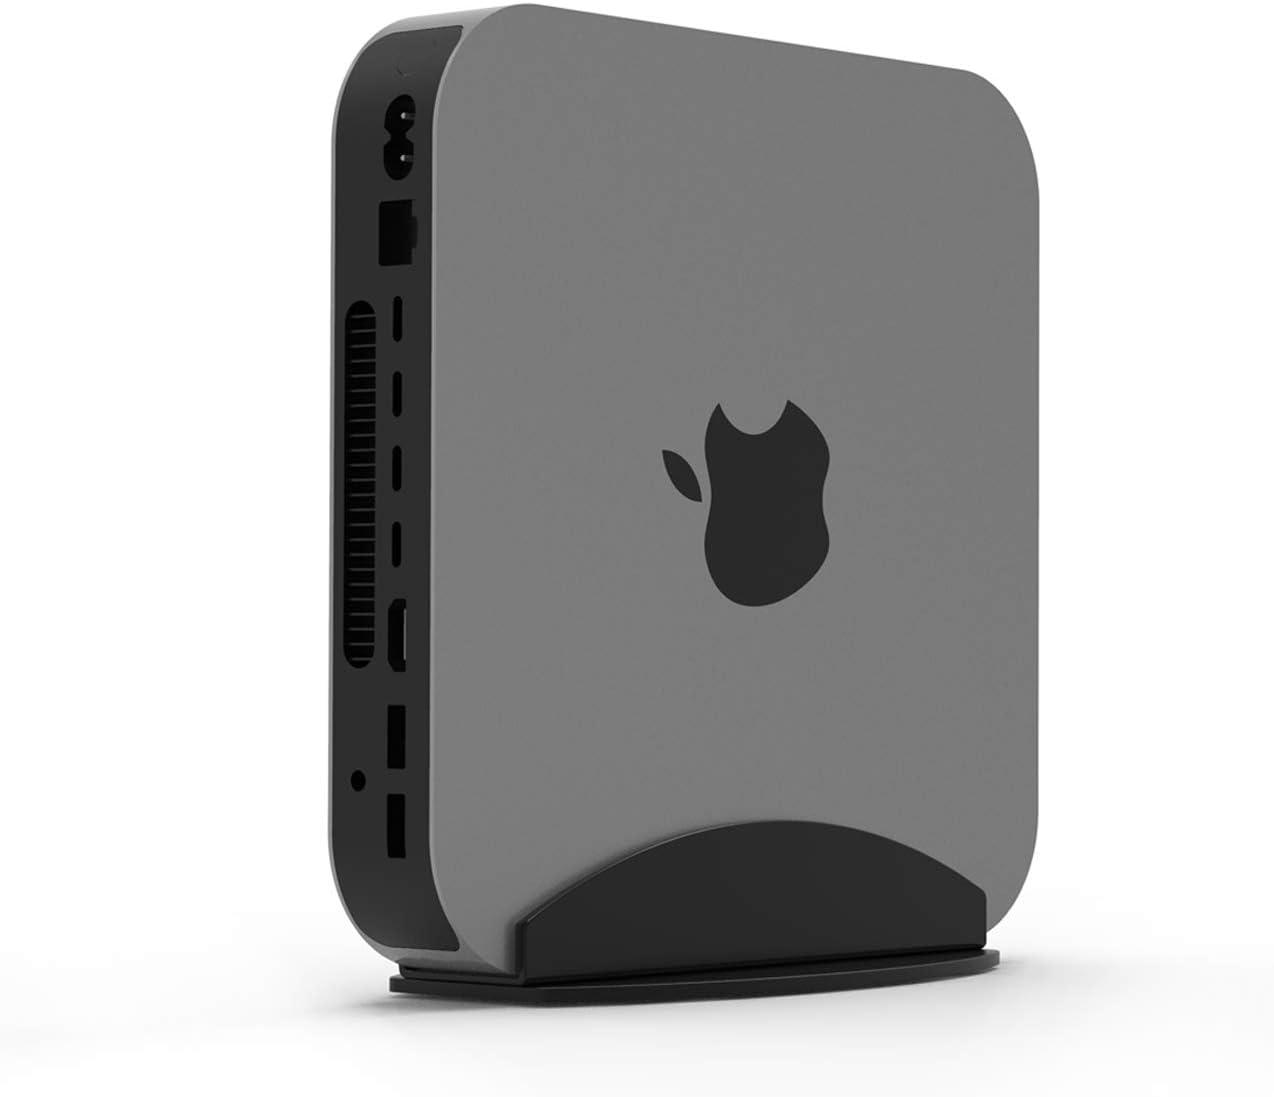 Cxmount Desktop Stand for Mac Mini 2010-2020